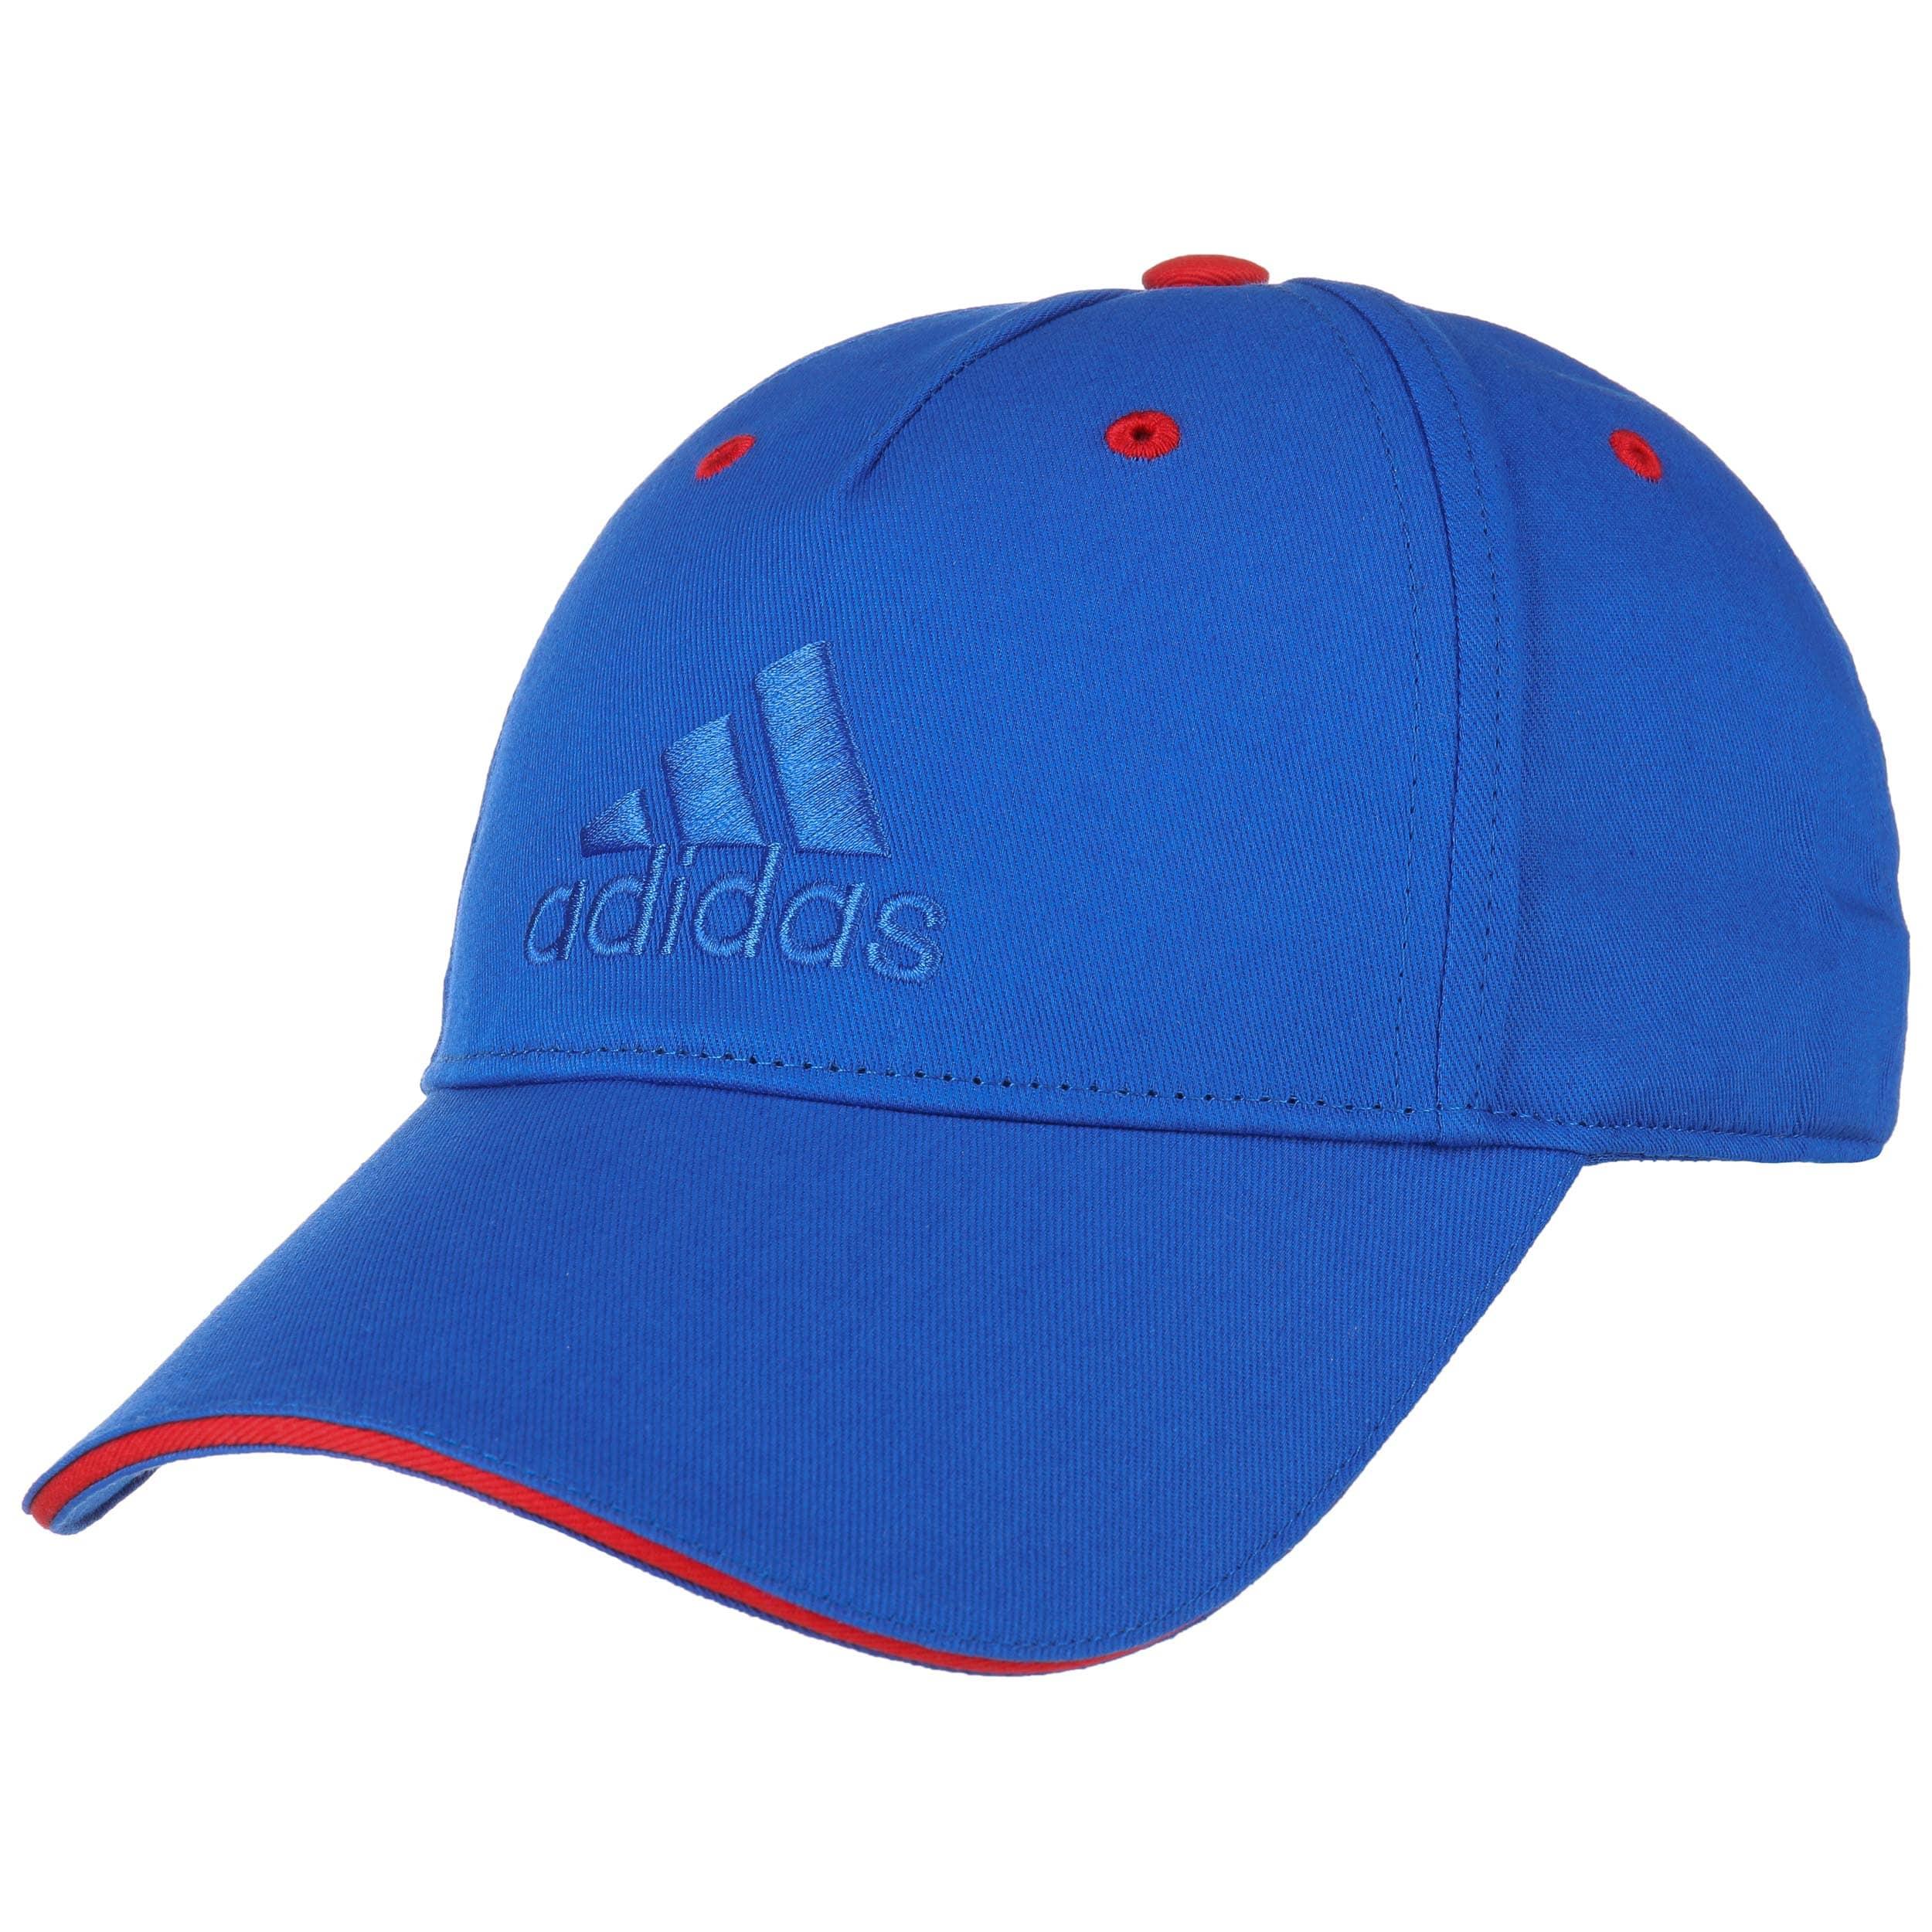 ... LK Graphic Cap by adidas - royal-blue 5 8026016ff87